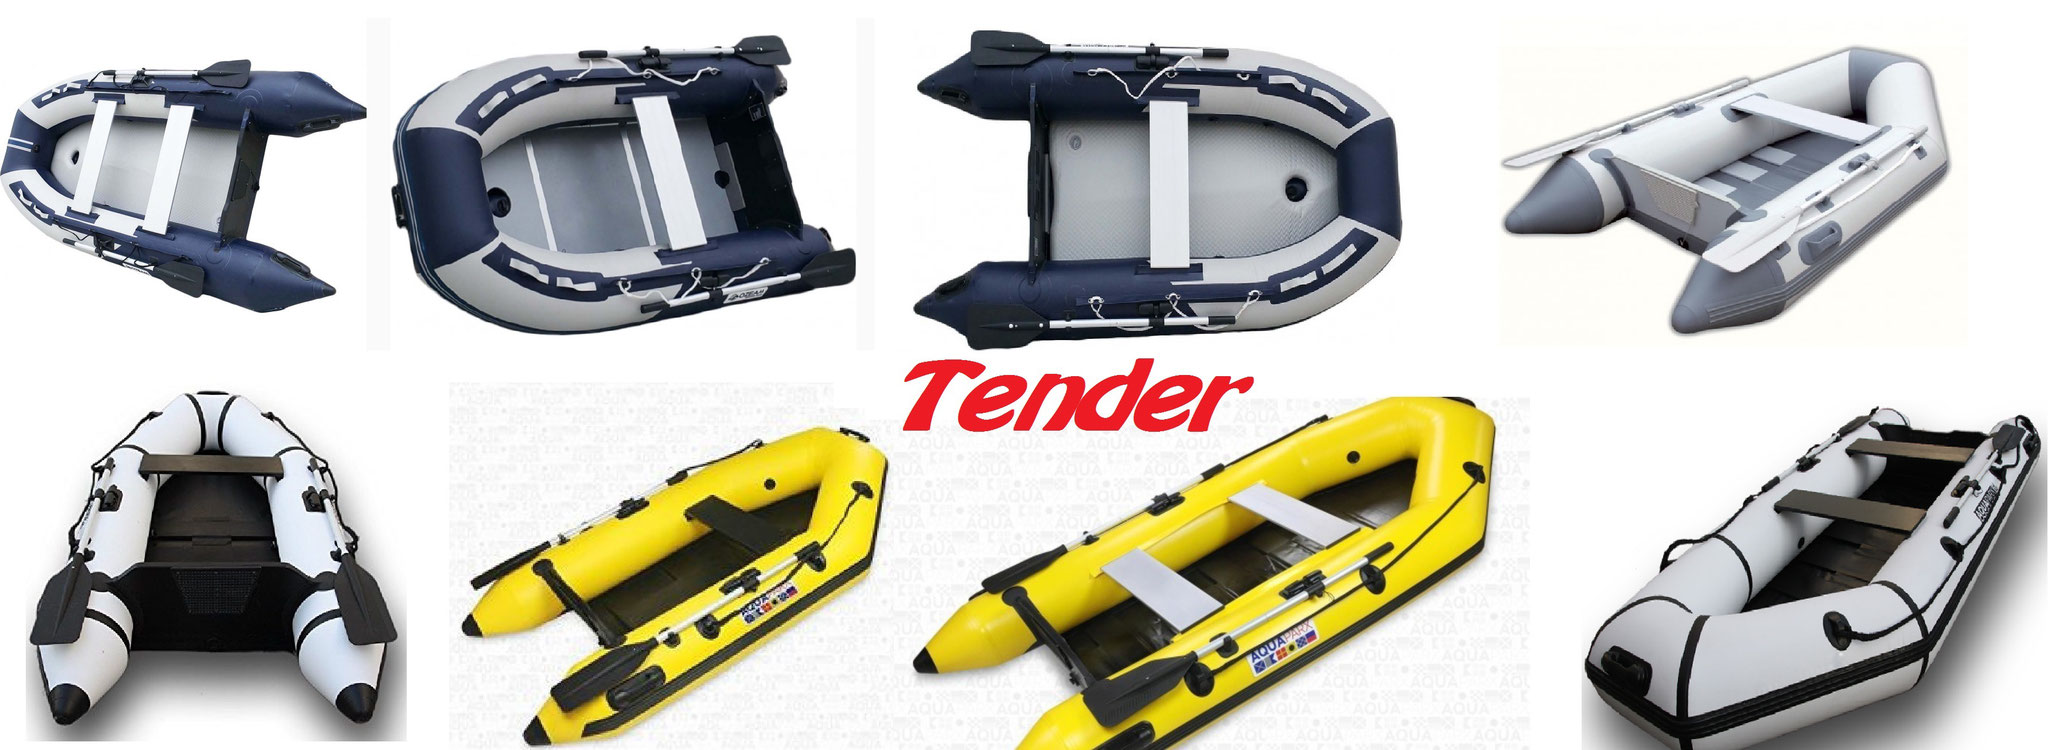 Tender Aquaparx - Ozeam - ViaMare e Z-Ray